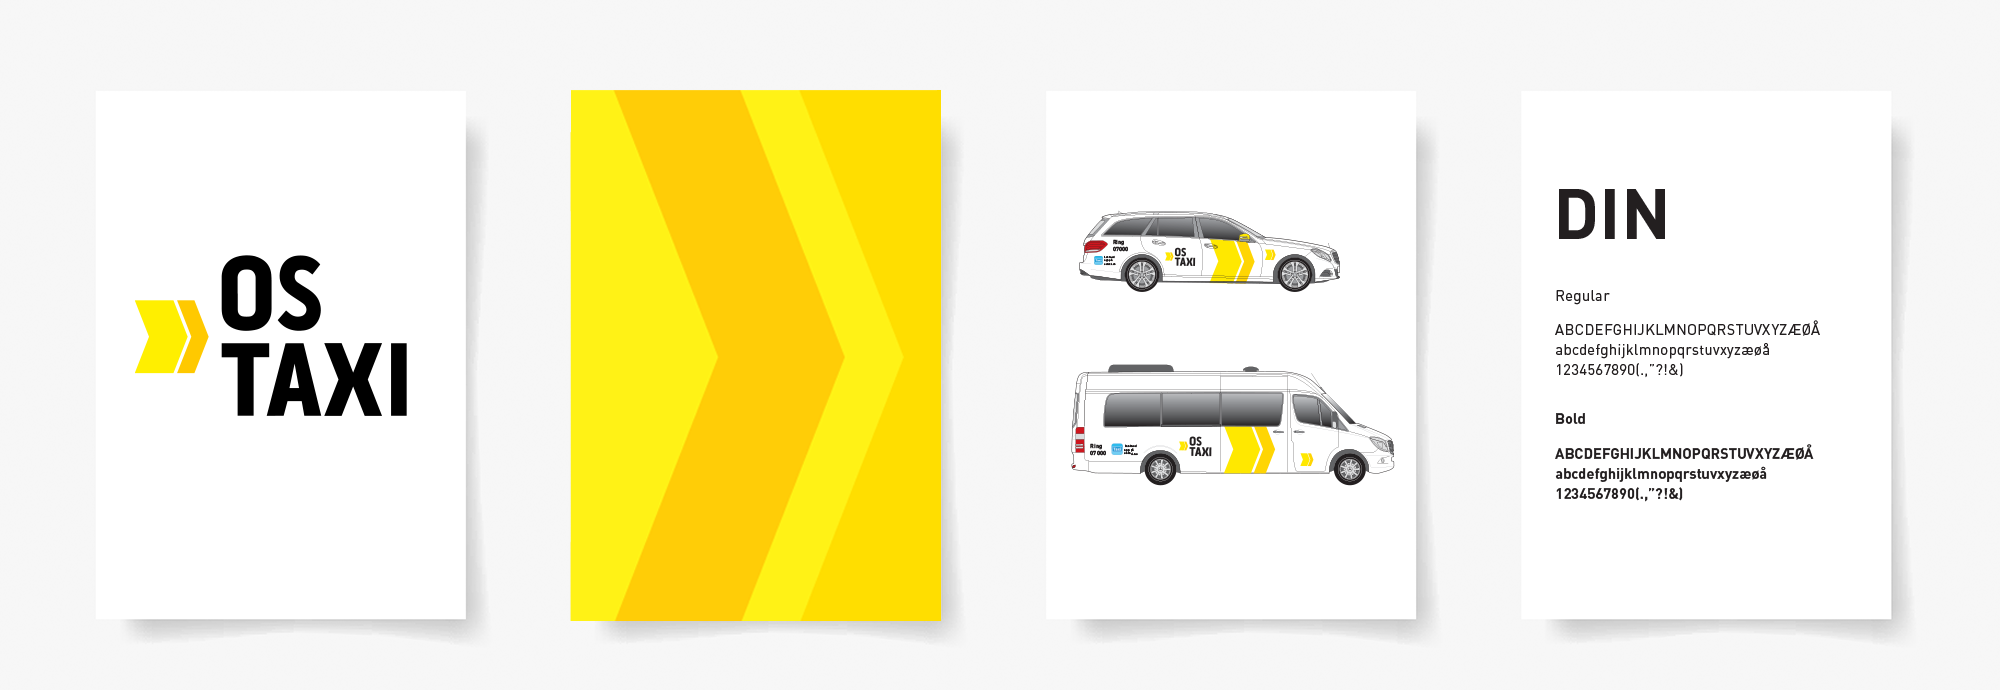 Os taxi - Identitetsdesign